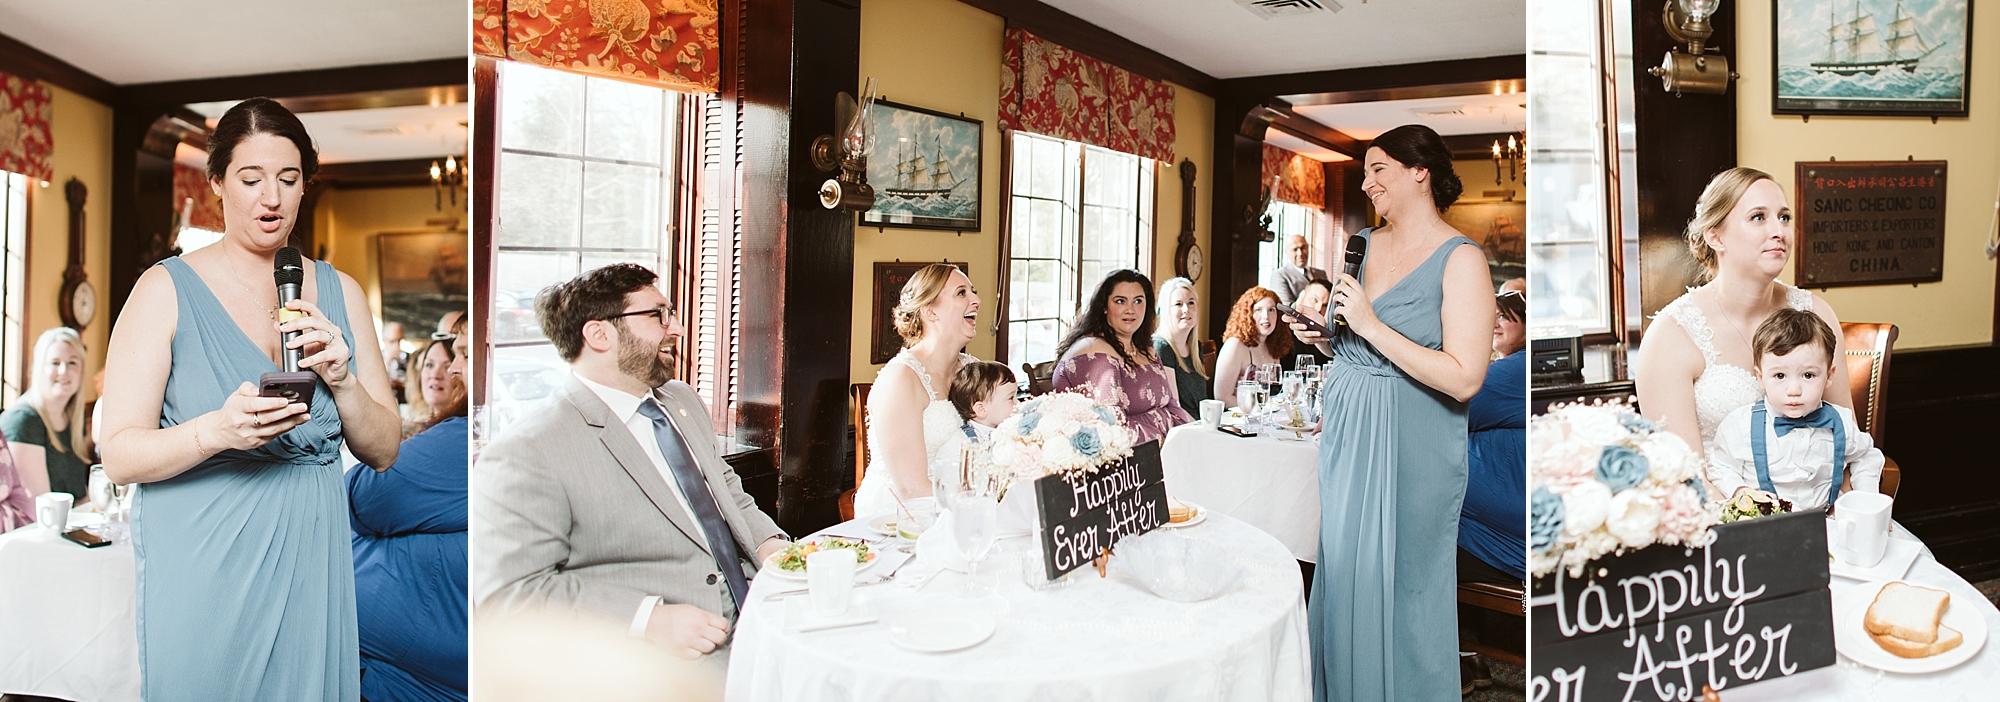 eisleyimages-concordcolonialinn-wedding_0074.jpg